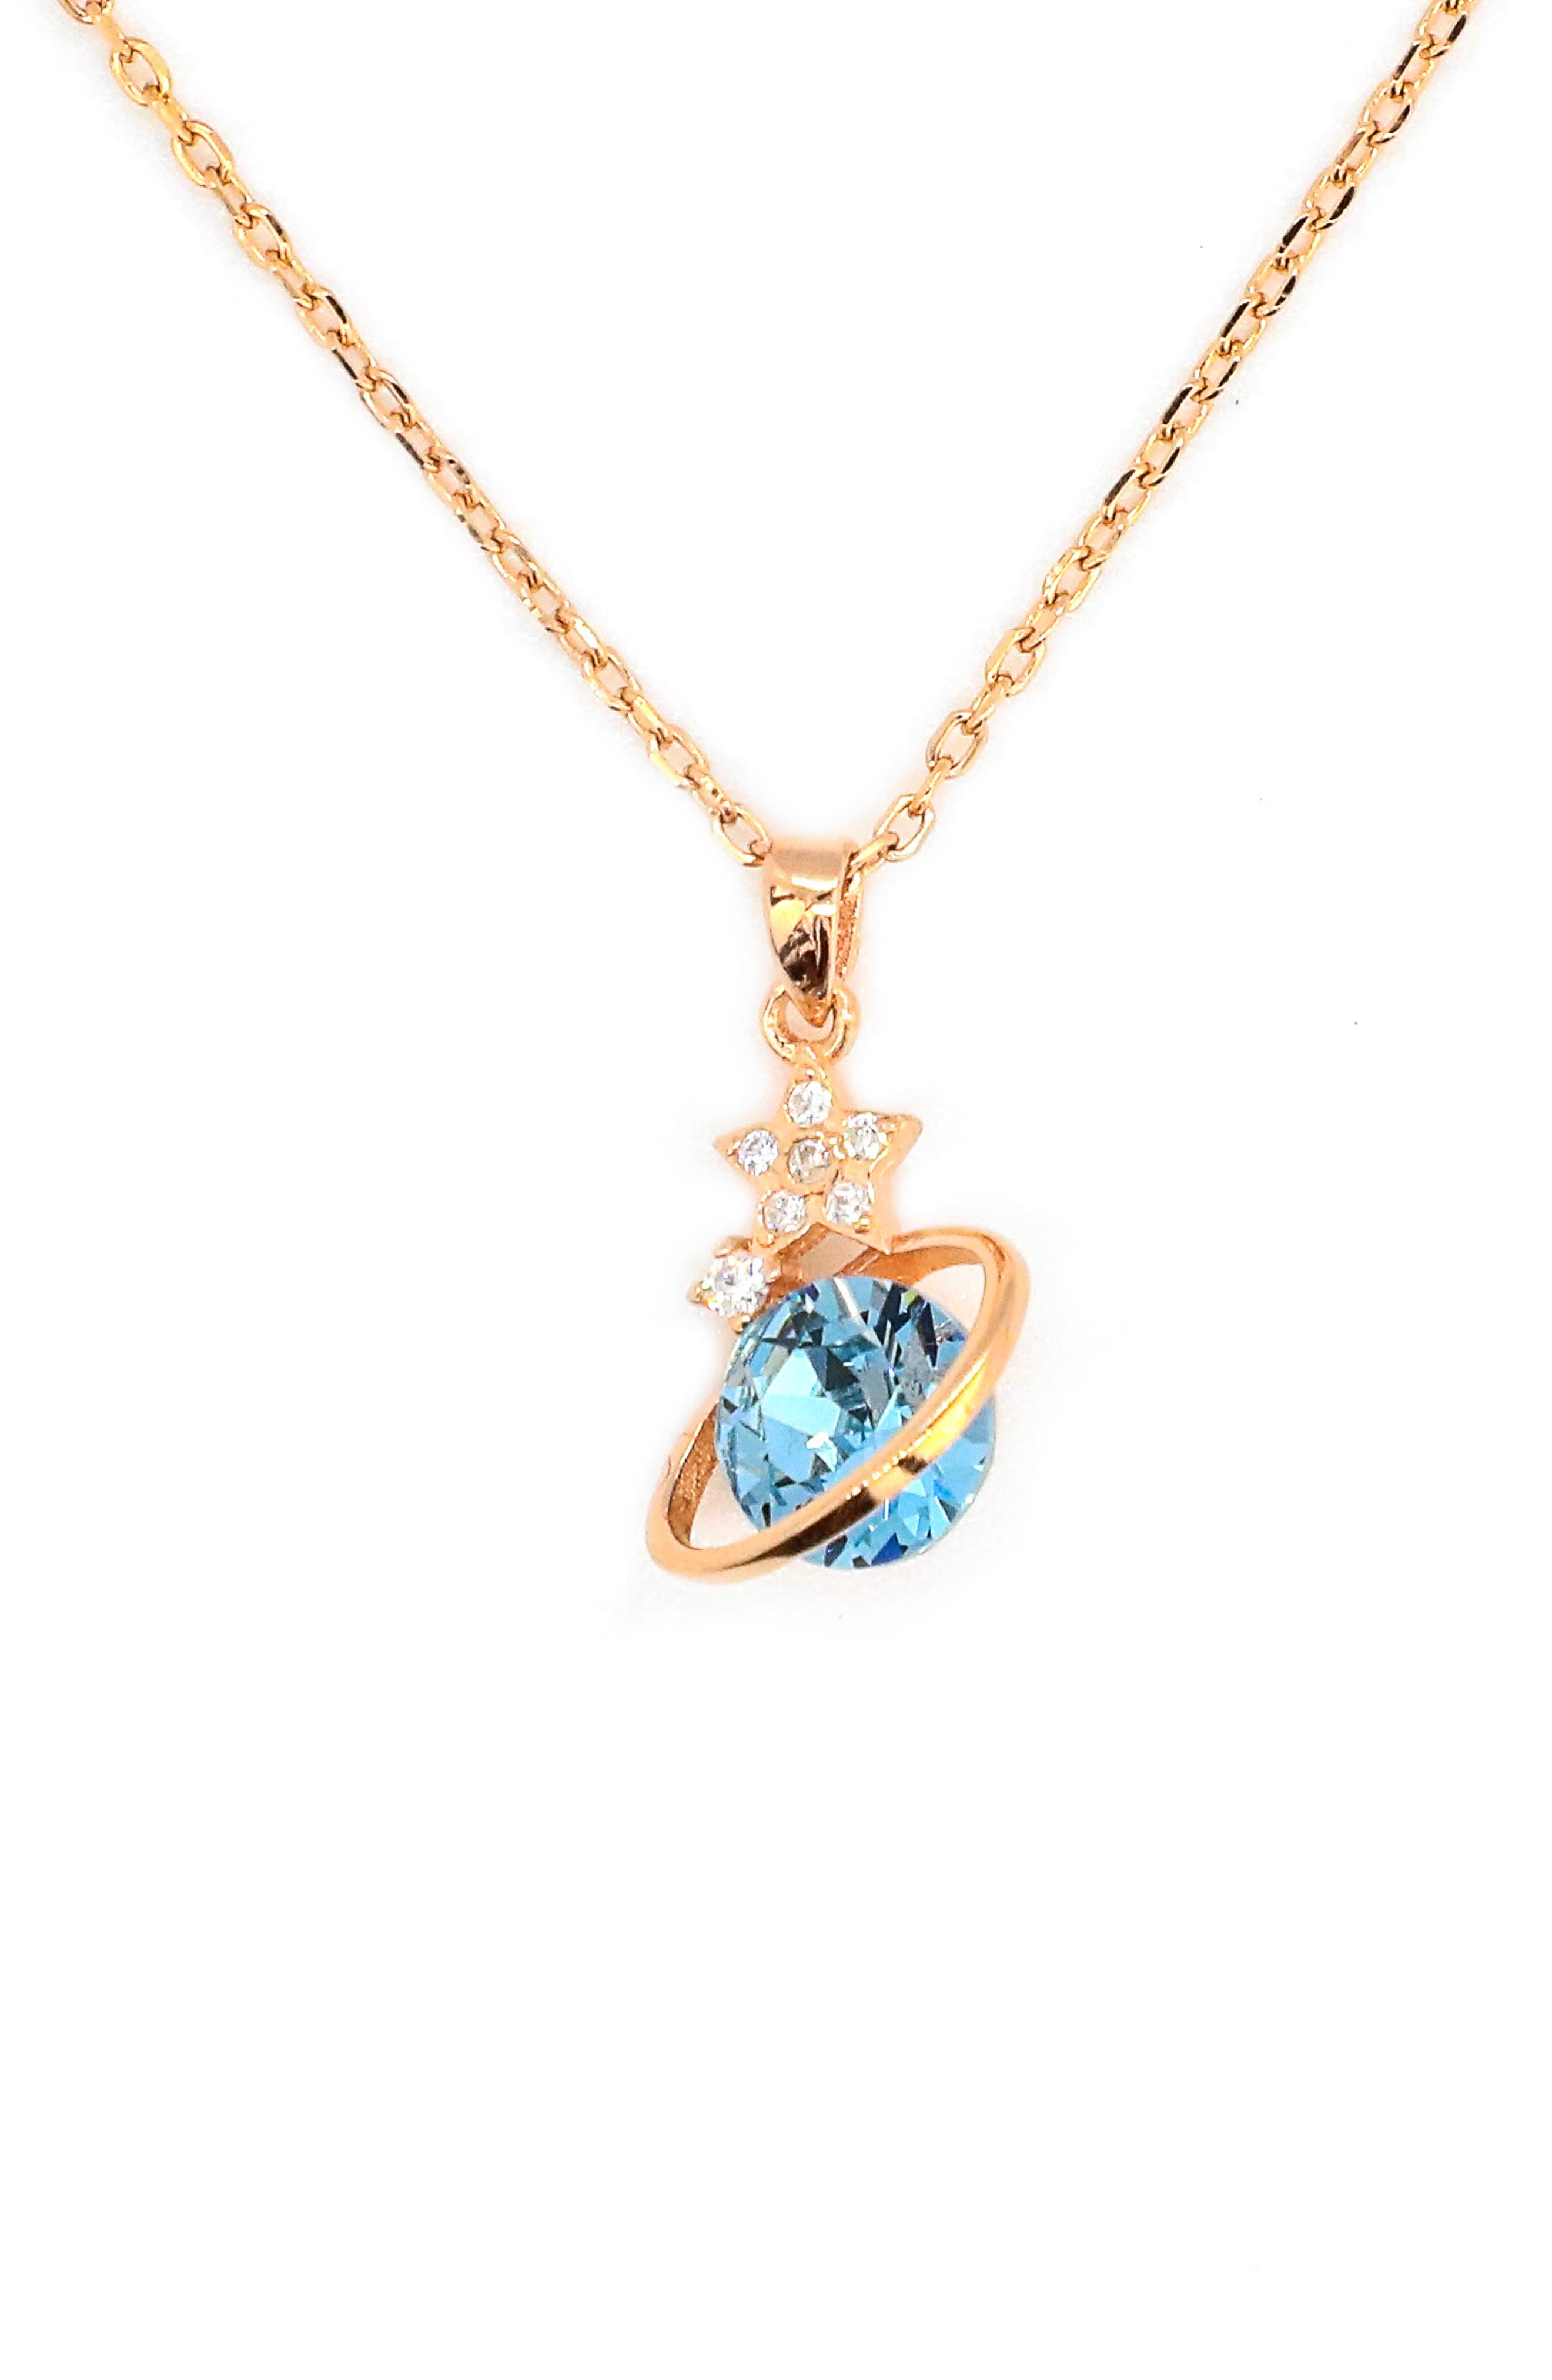 Dazzling Sloane Blue Jewel Planet Pendant Necklace